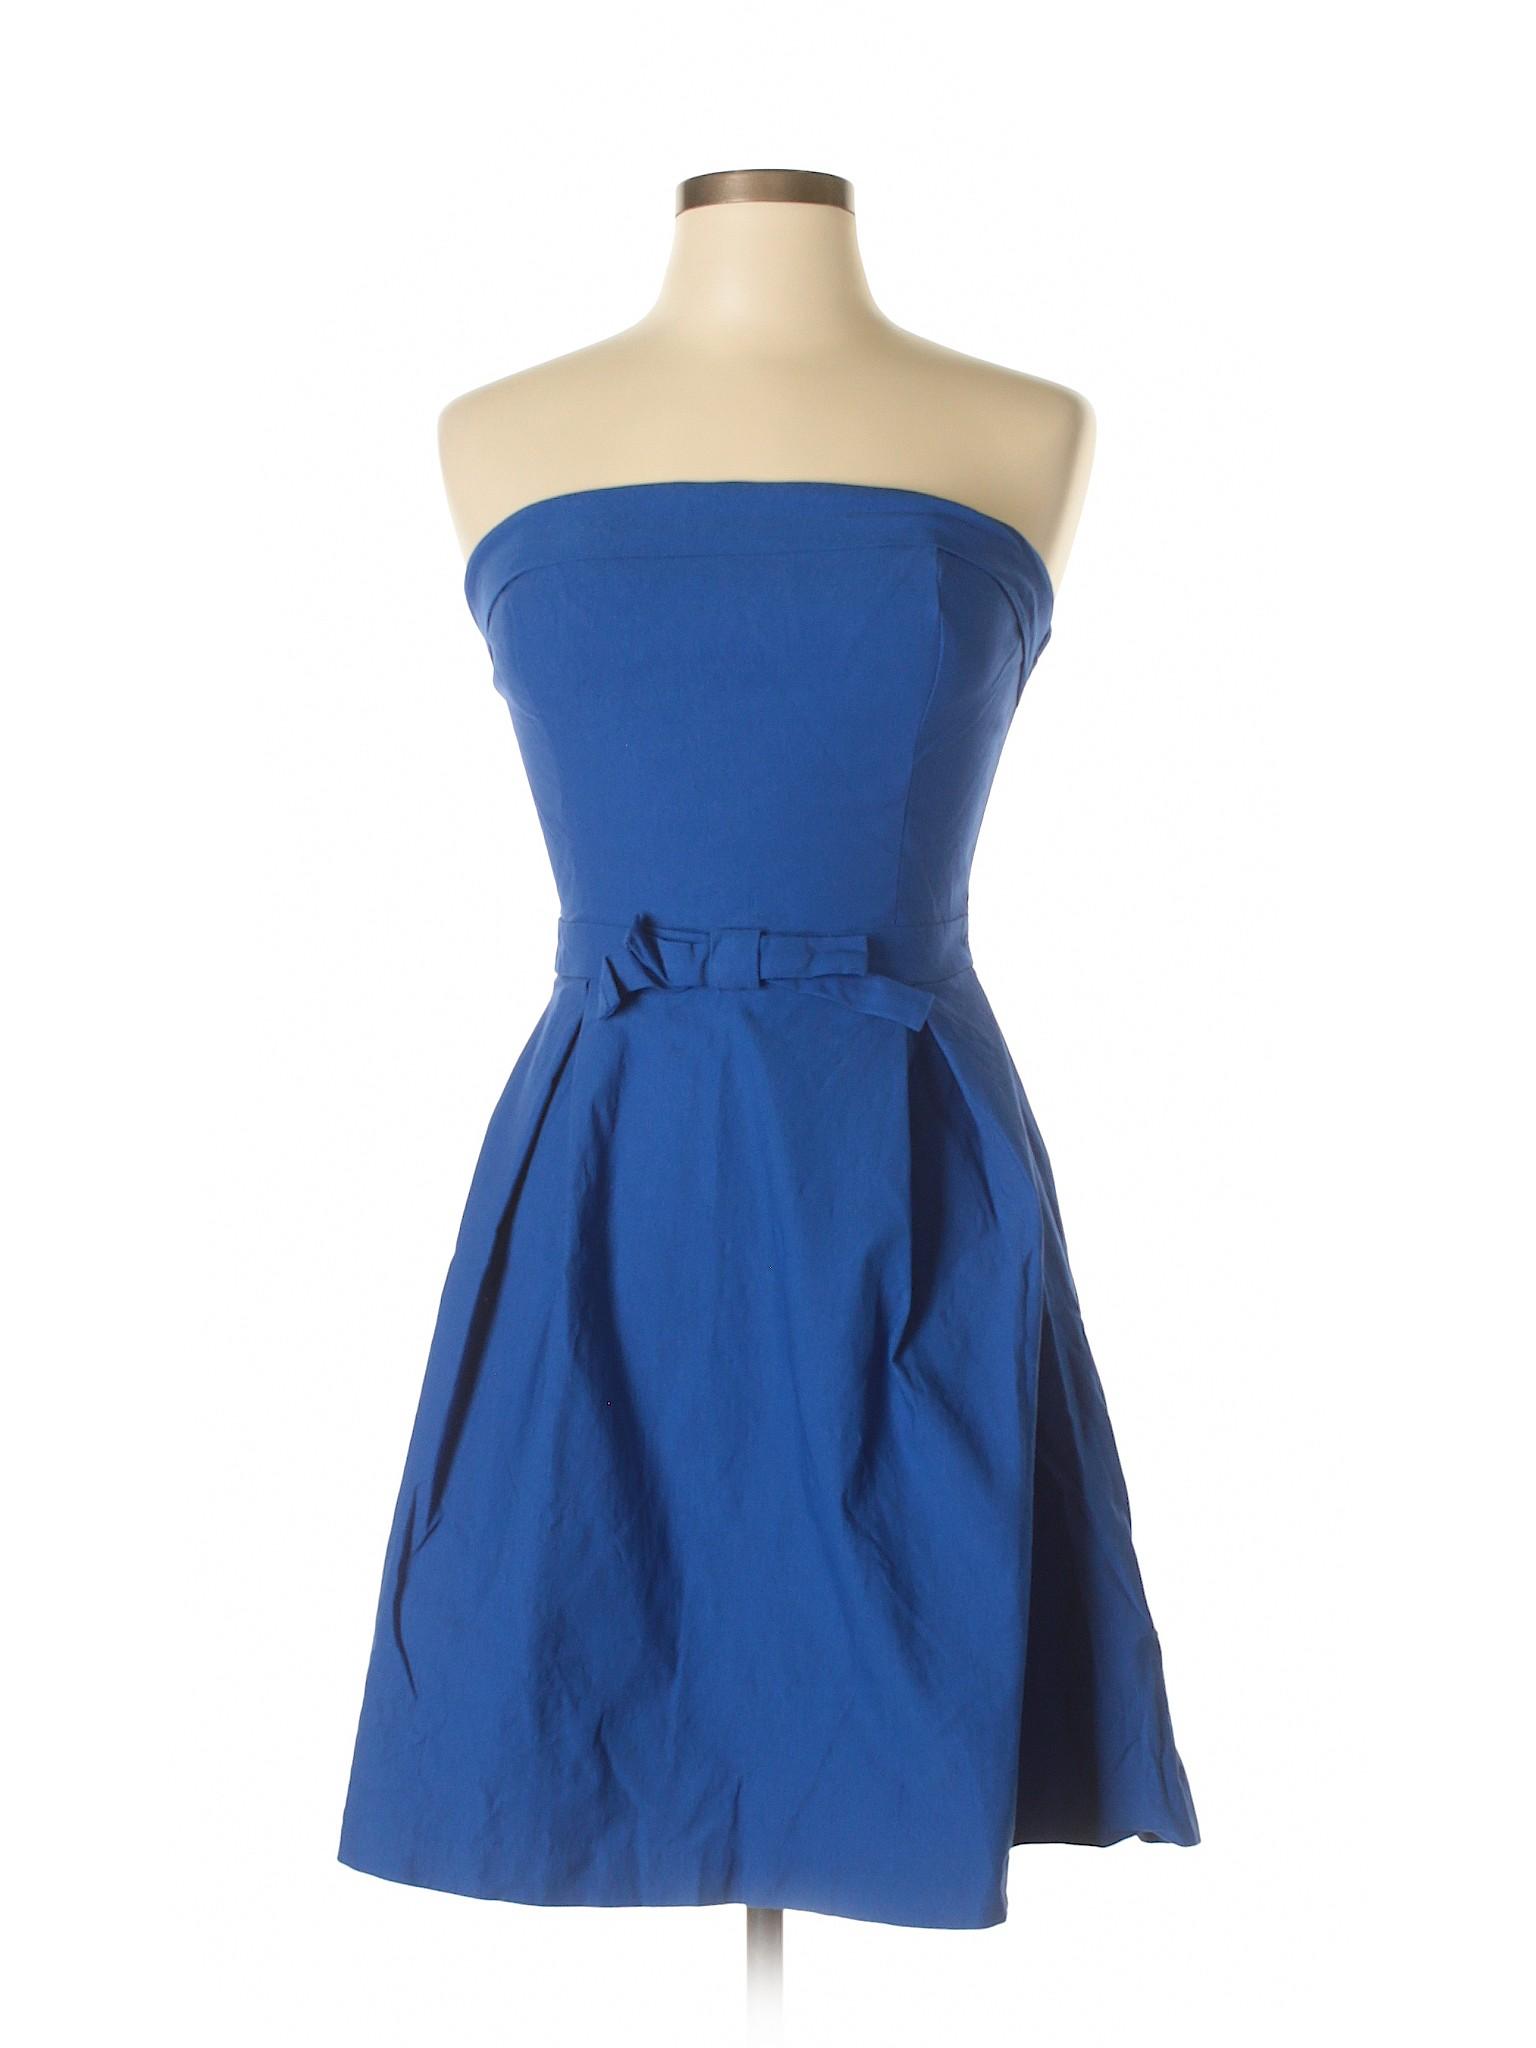 Dress Dress Dress Mystic Mystic Selling Casual Casual Selling Mystic Selling Casual 1AwqYfrxA